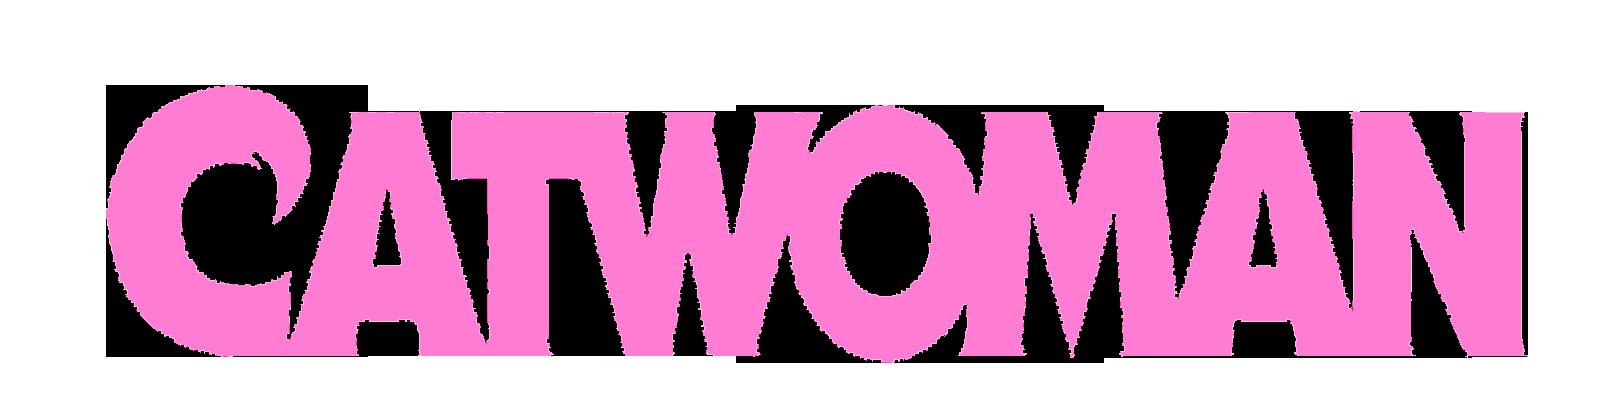 Catwoman Logo Hot Pink Copy